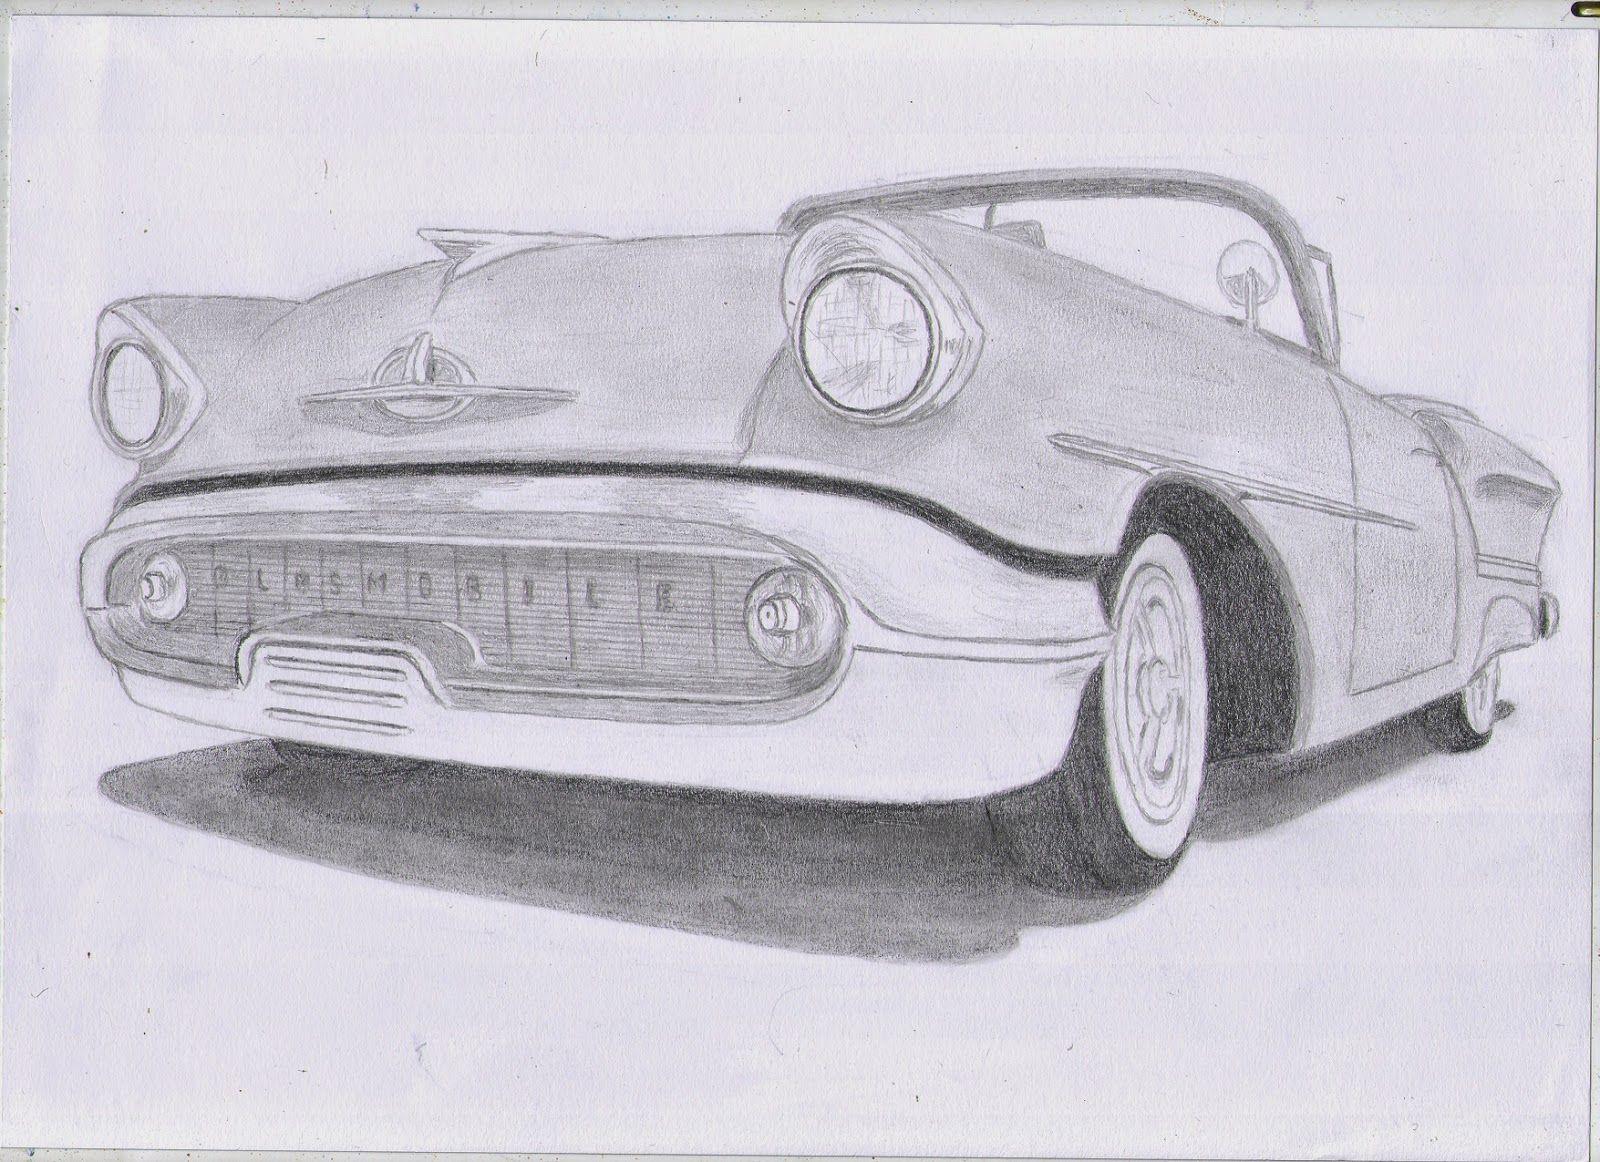 Classic Car Drawings: 1957 Oldsmobile Starfire 98